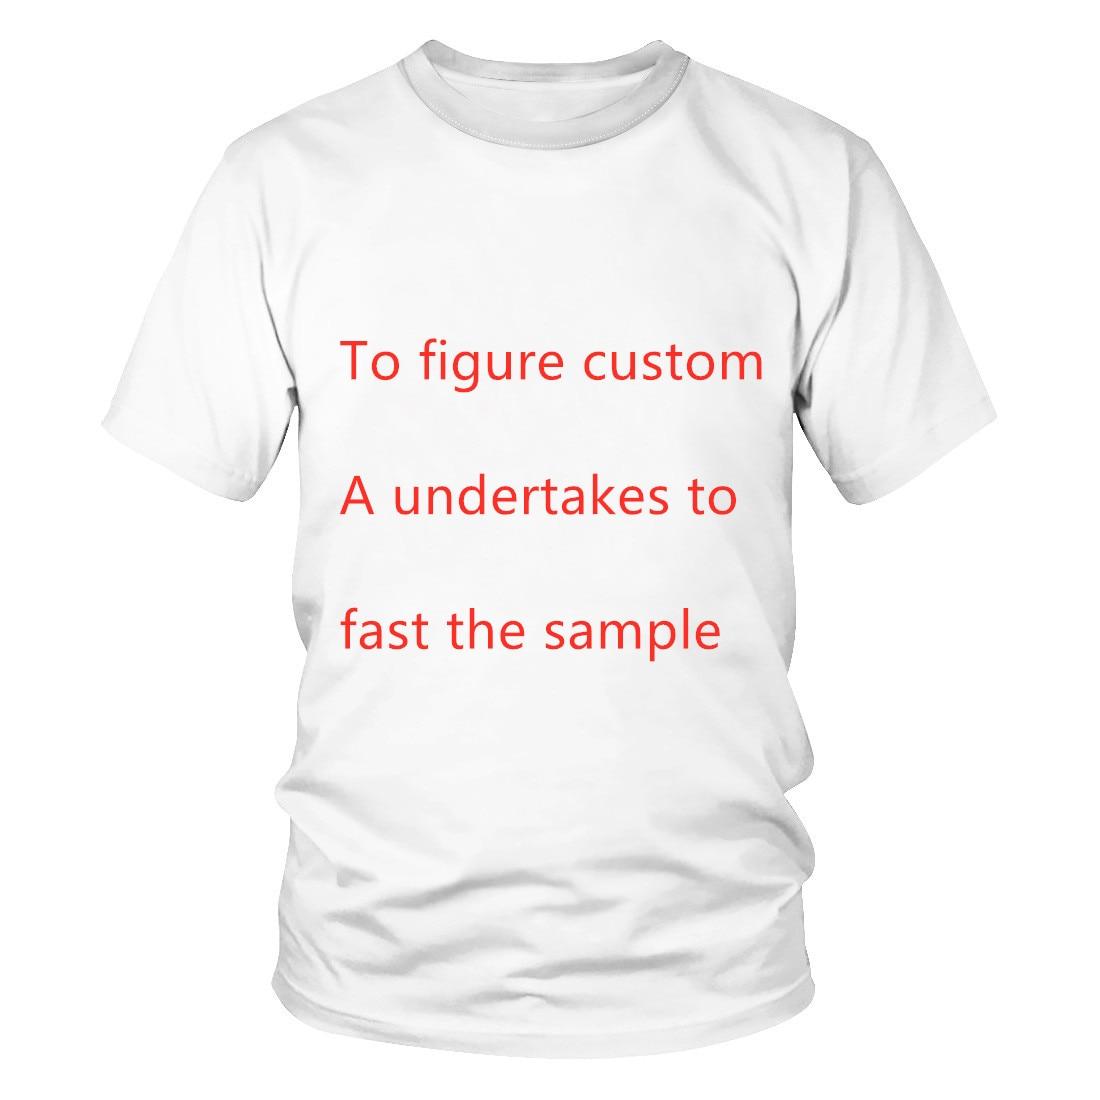 2020 masculino 3d t-shirts fabricantes vender diretamente personalizado 3d impresso camiseta feminina personalizado S-5xl crianças 3d camiseta